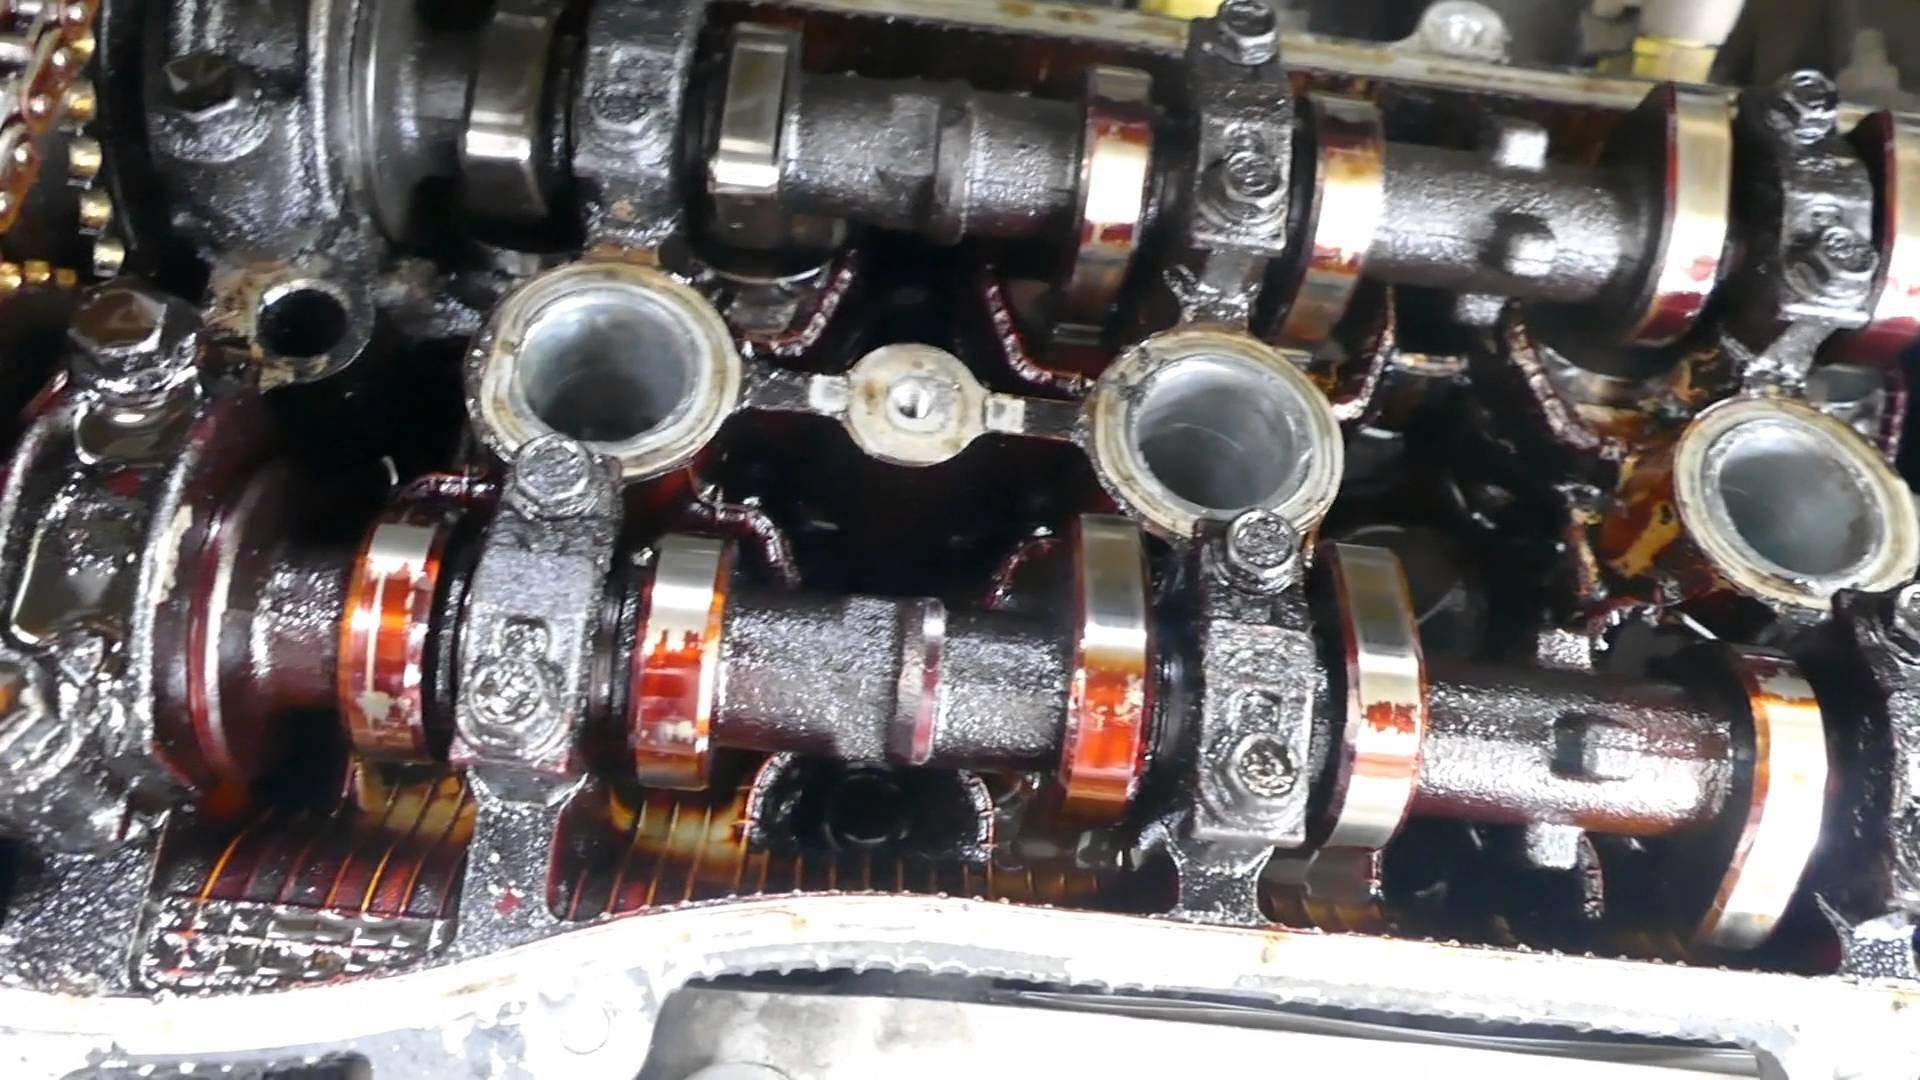 1998 toyota Rav4 Engine Diagram Part 1 2003 Rav4 1az Fe Repair and Diagnosis Of Camshaft Engine Of 1998 toyota Rav4 Engine Diagram